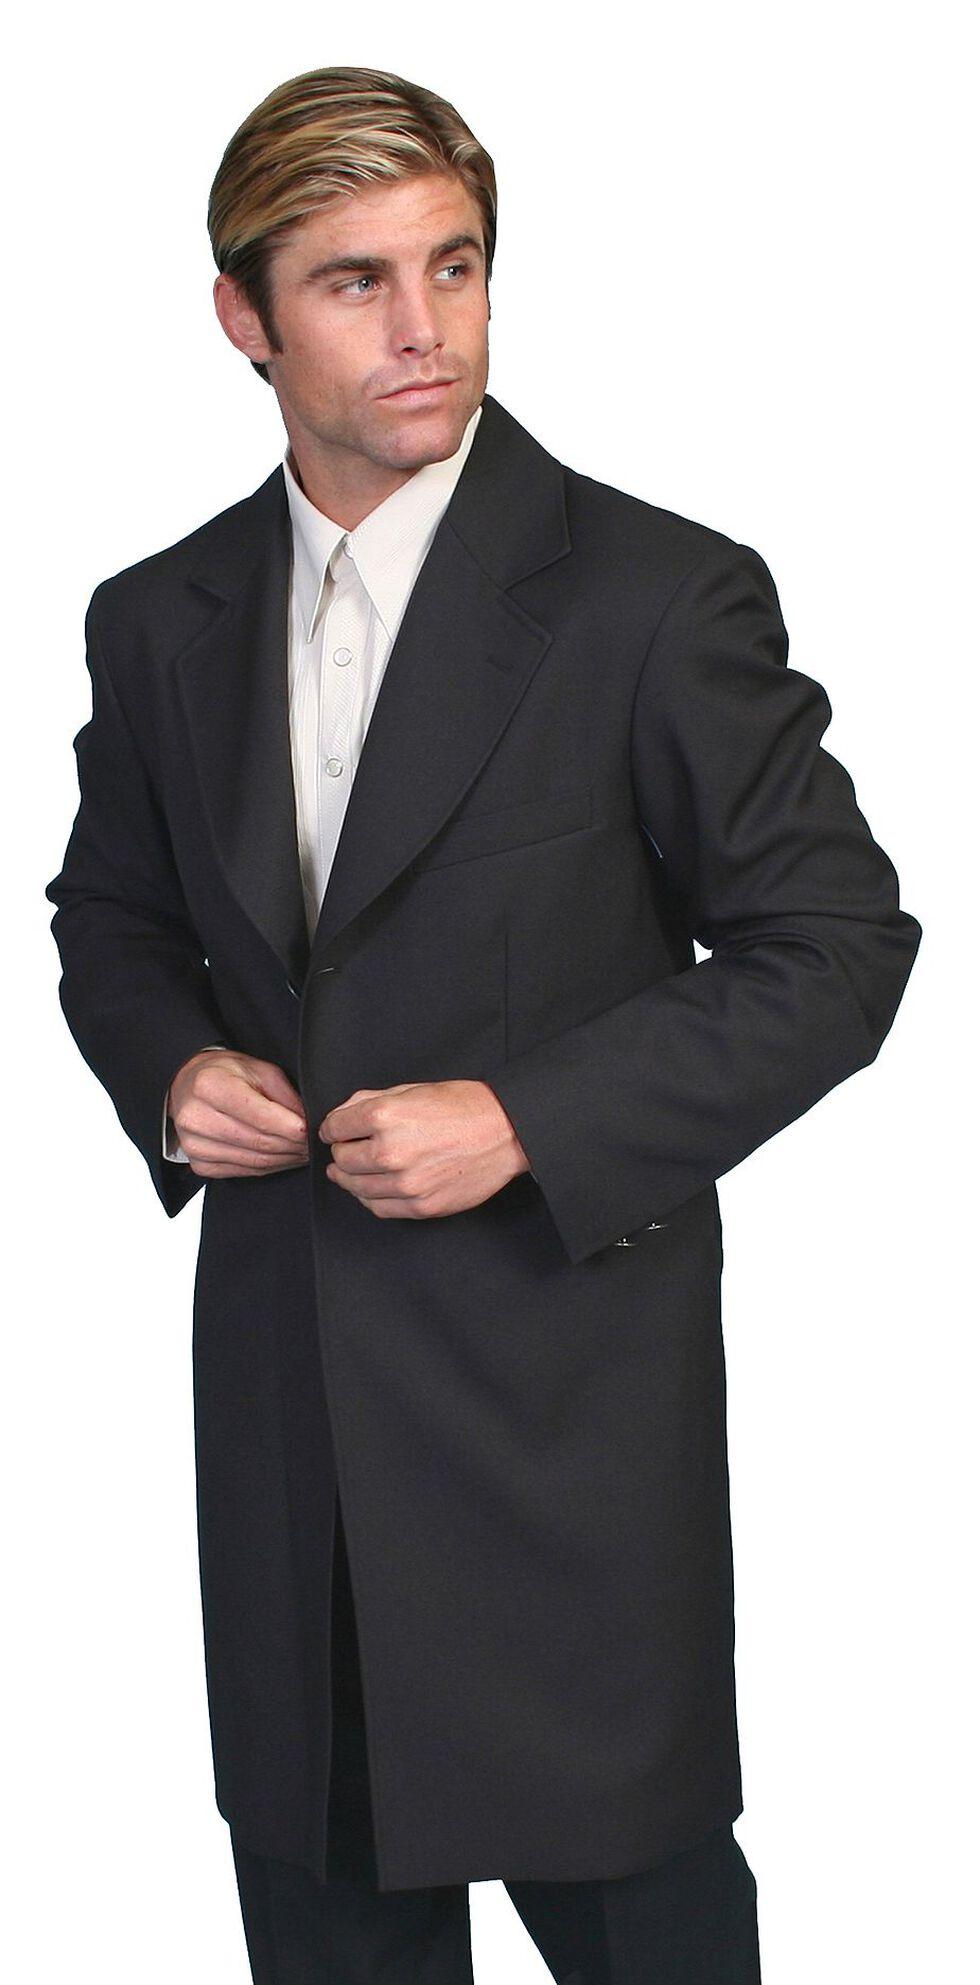 RangeWear by Scully Frock Coat, Black, hi-res